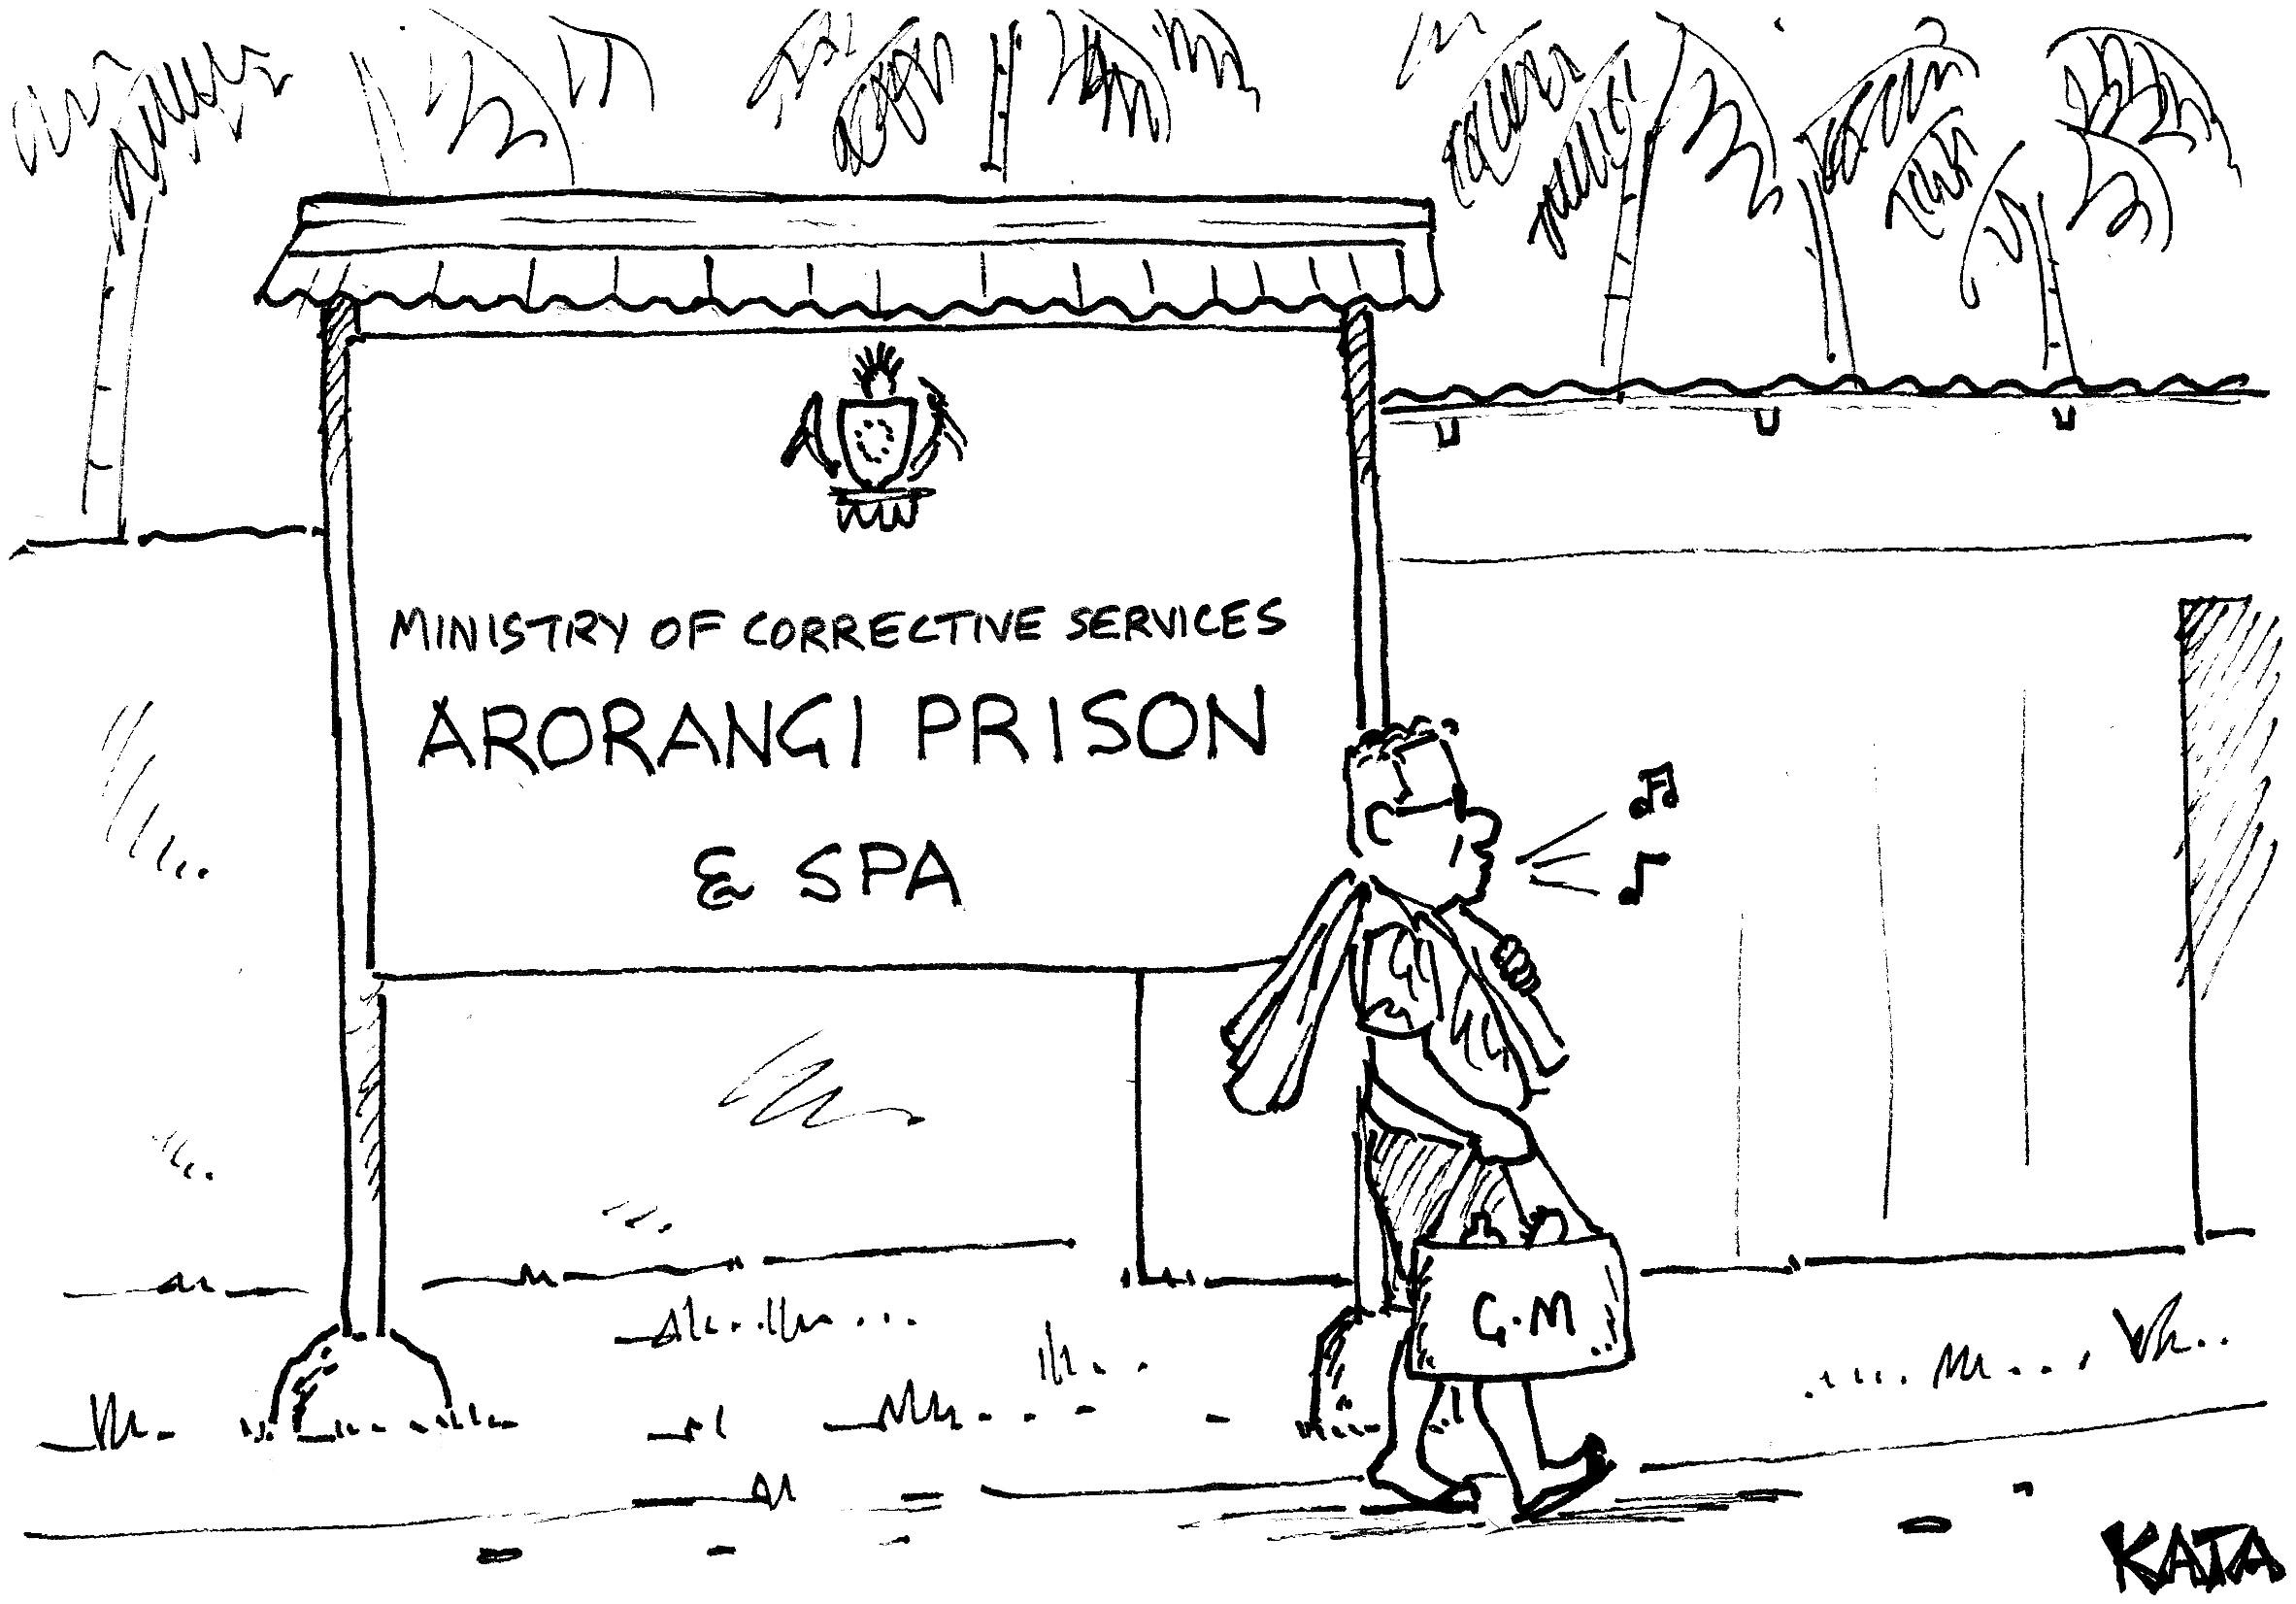 KATA: Arorangi Prison & Spa?